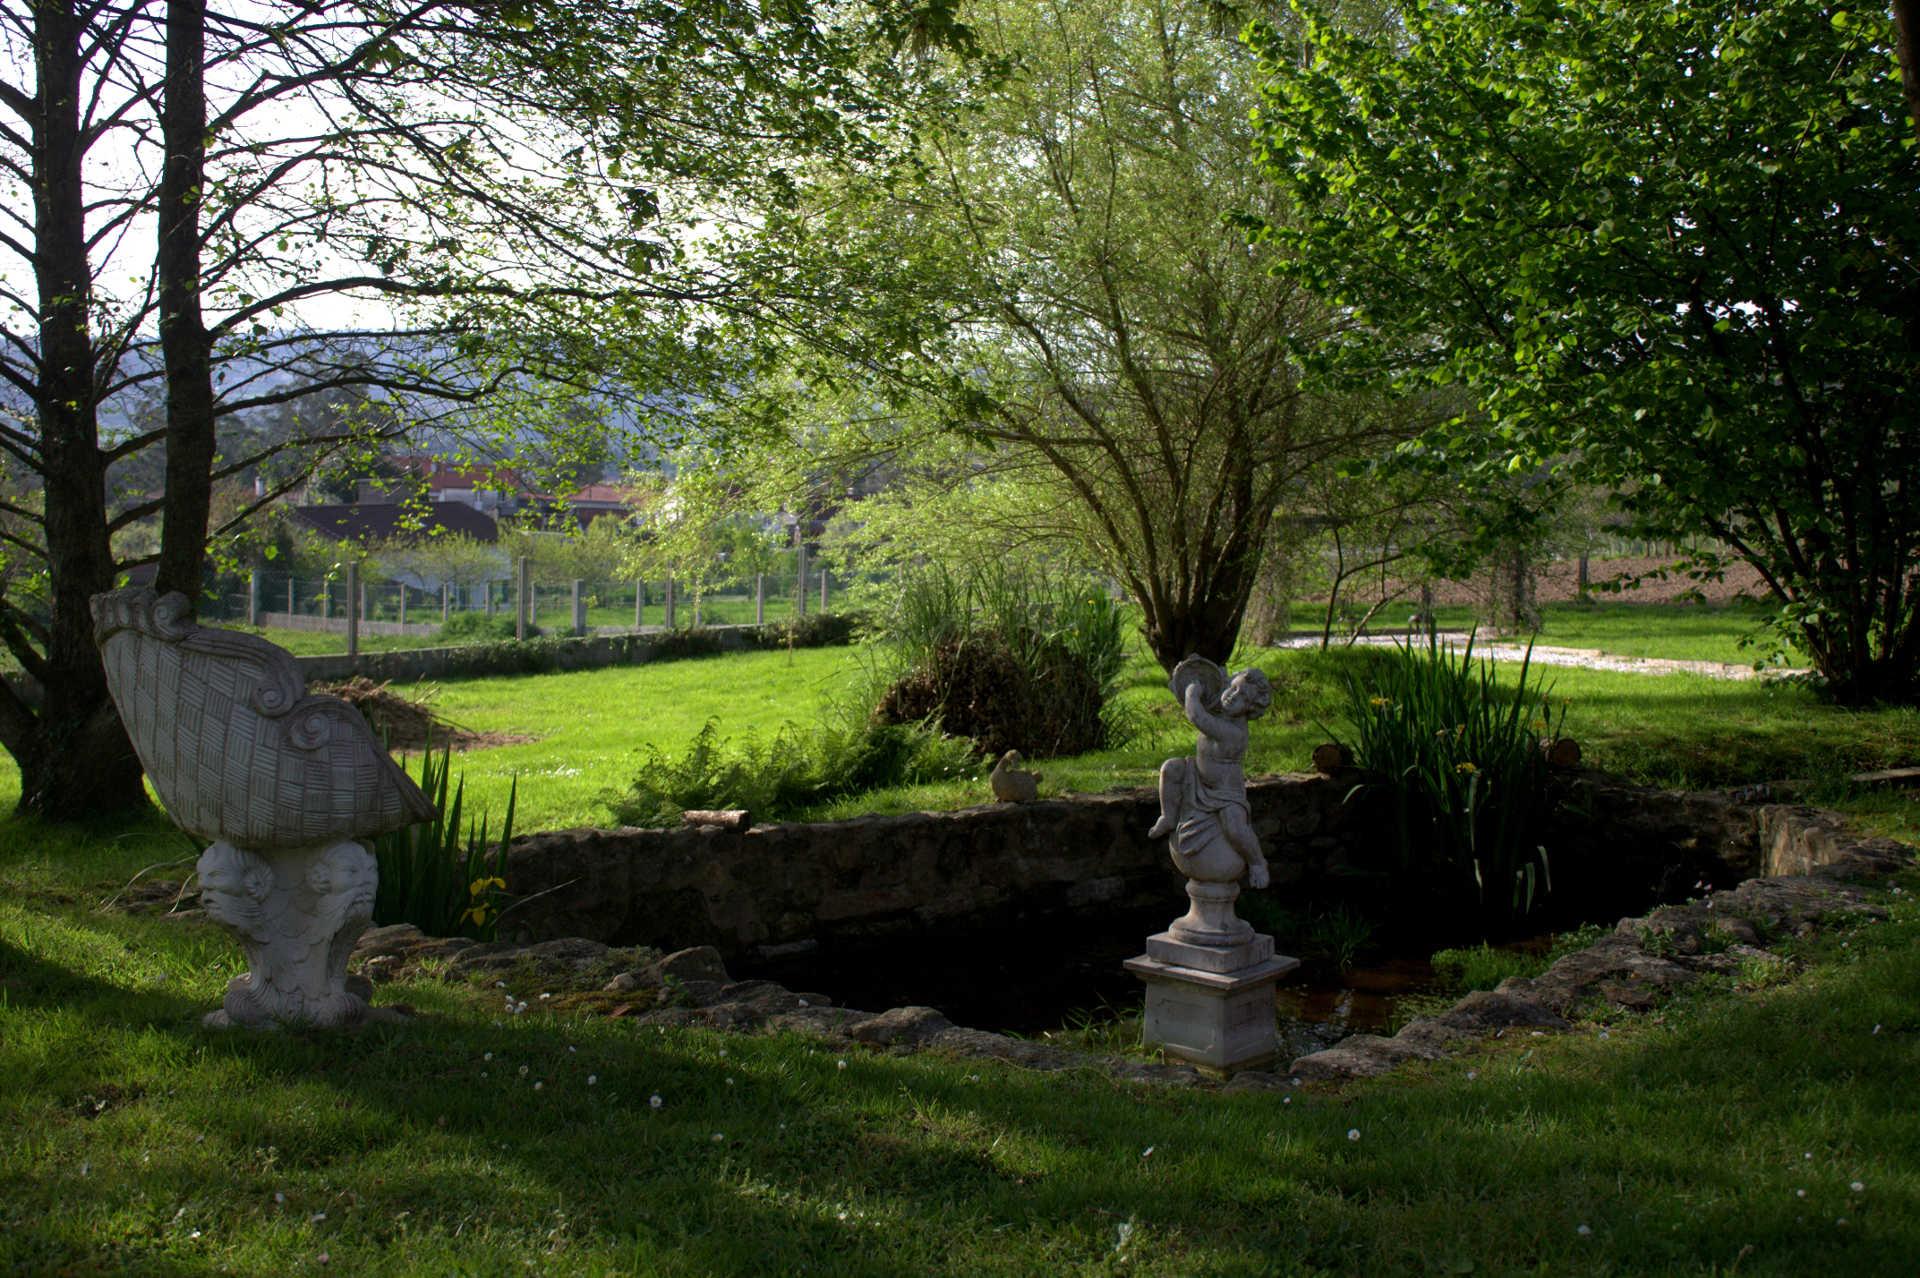 Jardines exteriores fuente angeles casa rural as seis for Casa rural mansion terraplen seis